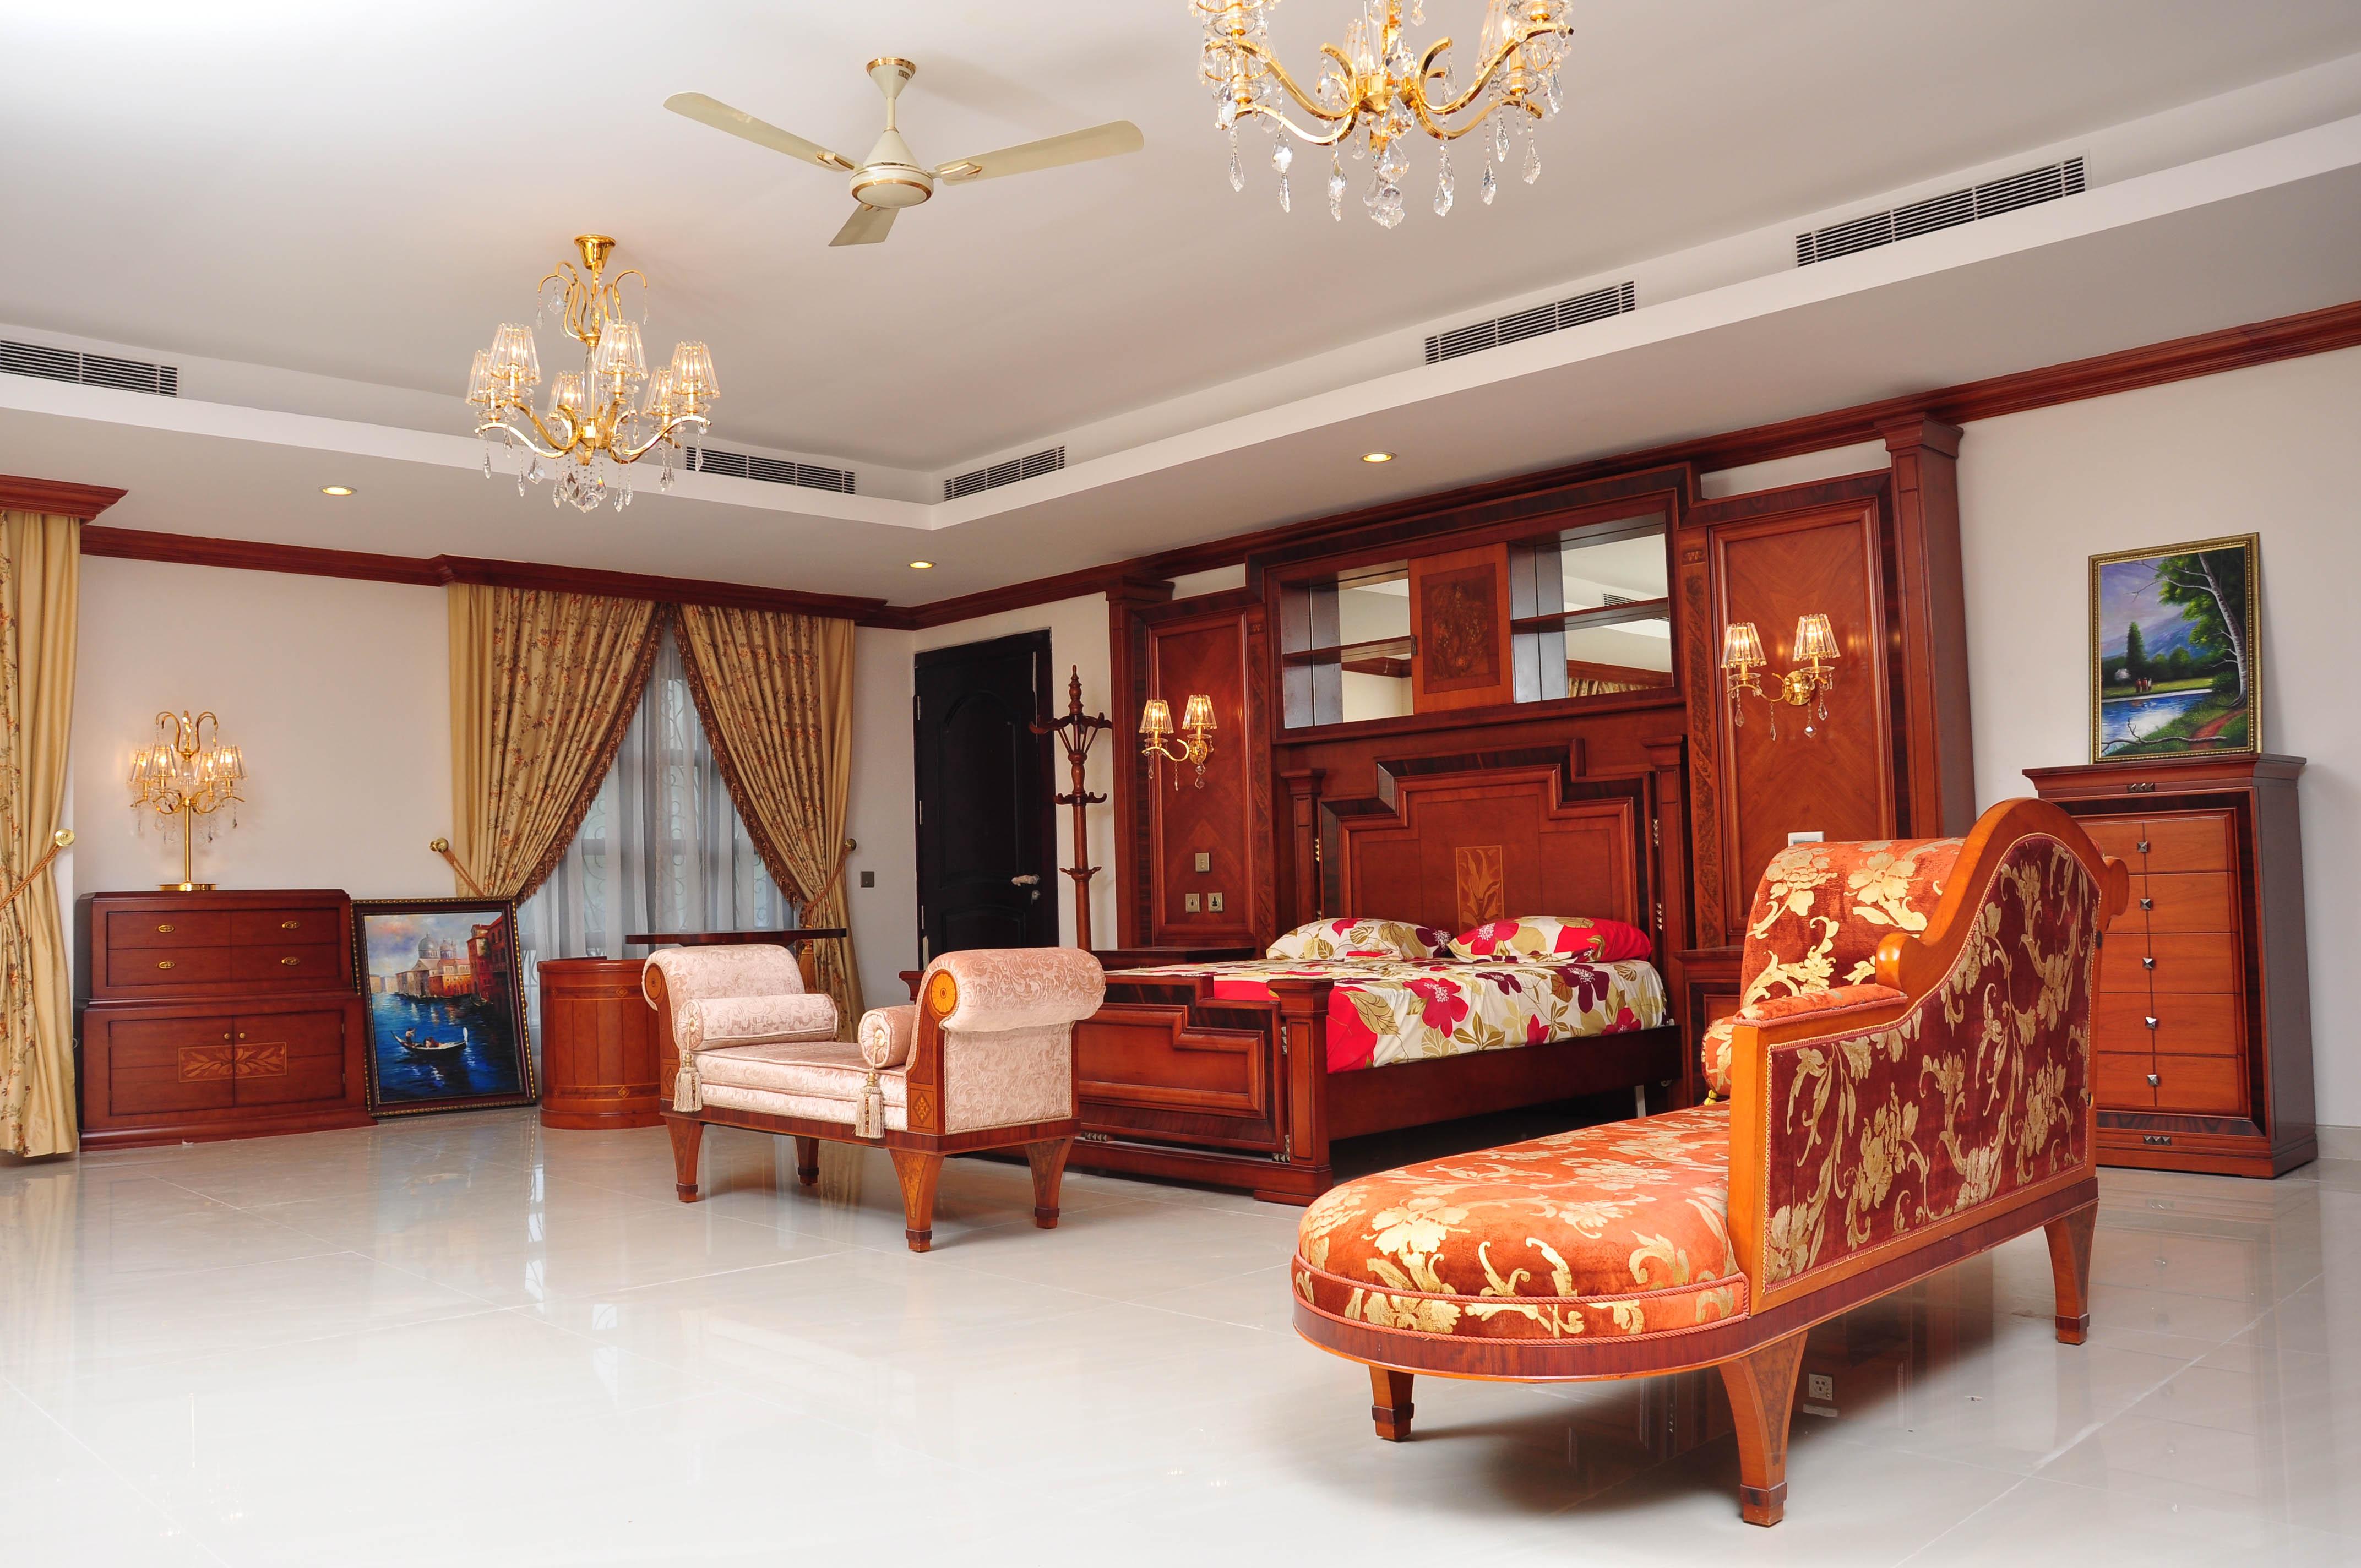 Royal Rooms, Architect, Light, Wooden, Villa, HQ Photo